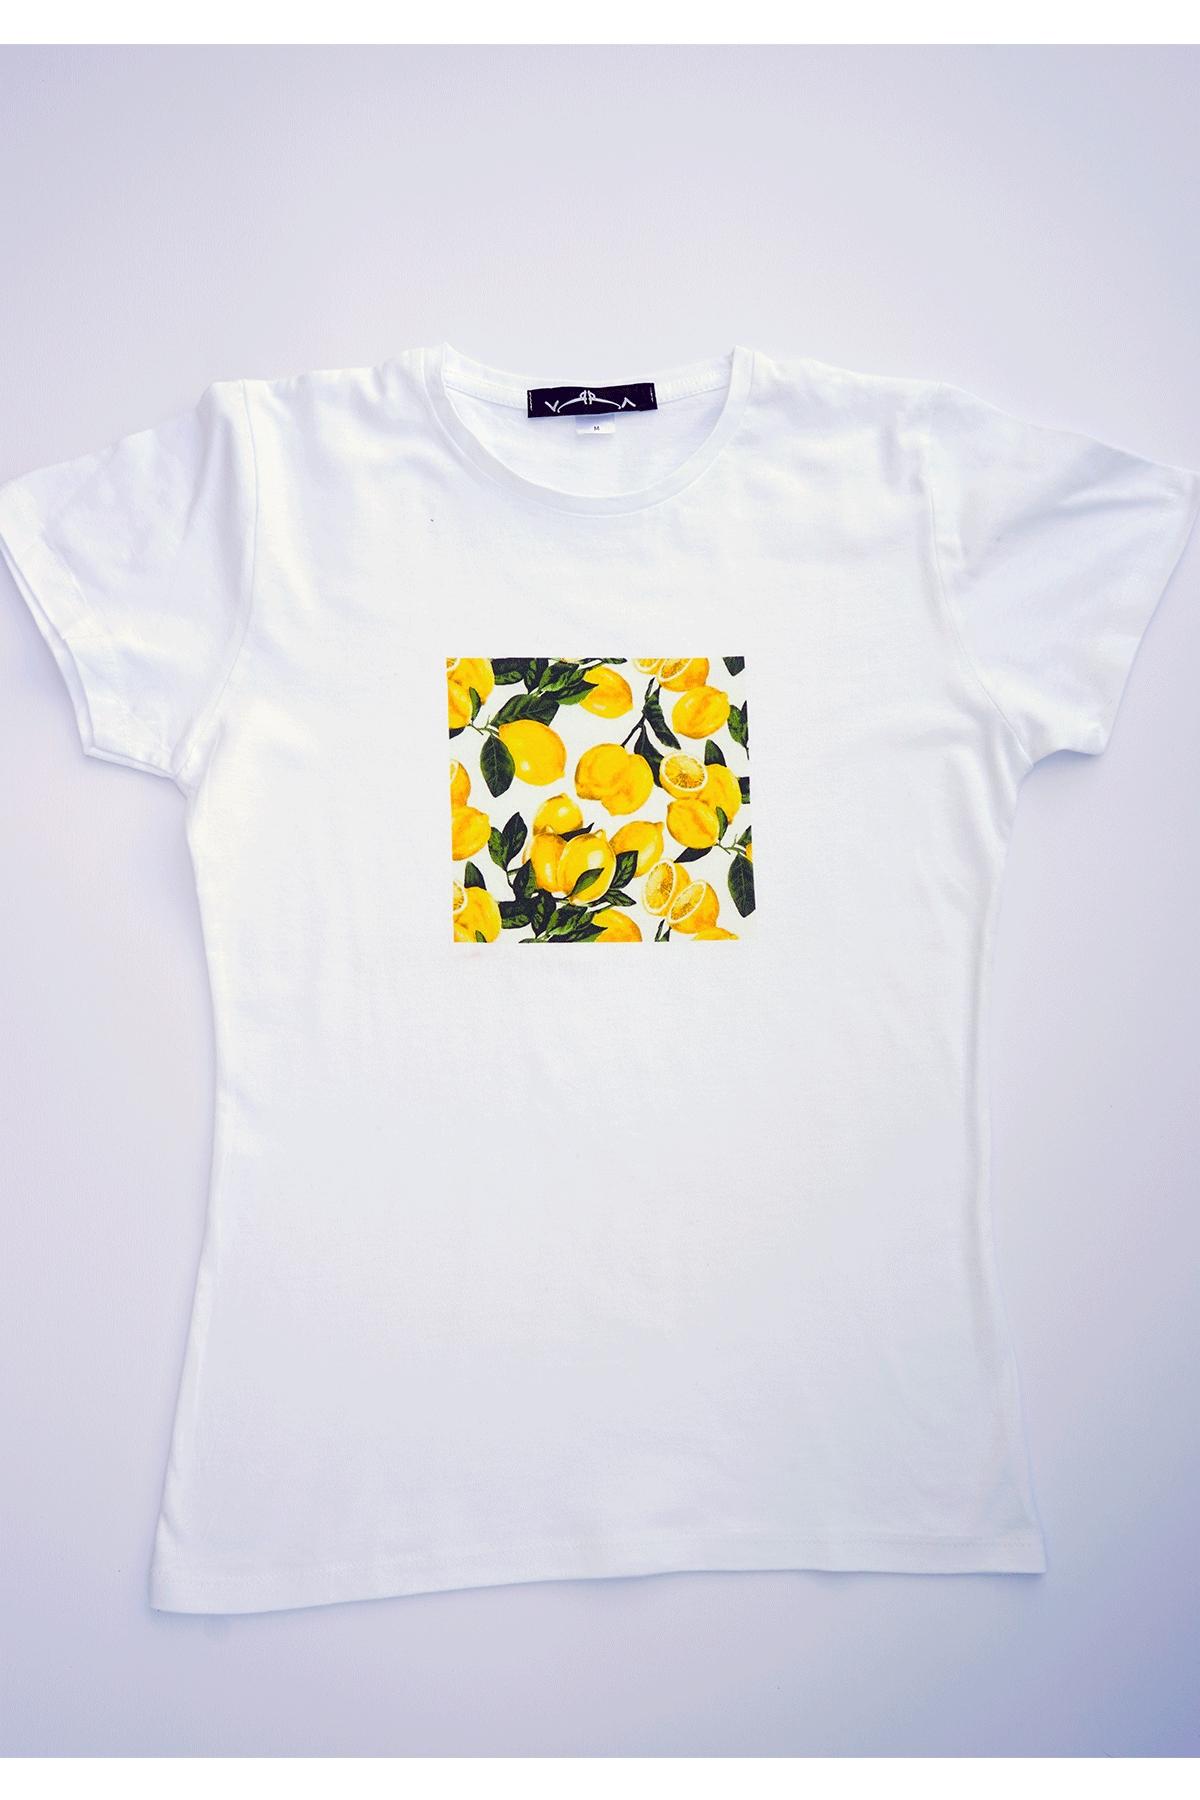 Бяла тениска лимонена авантюра / VЯRA за MUSE SHOP